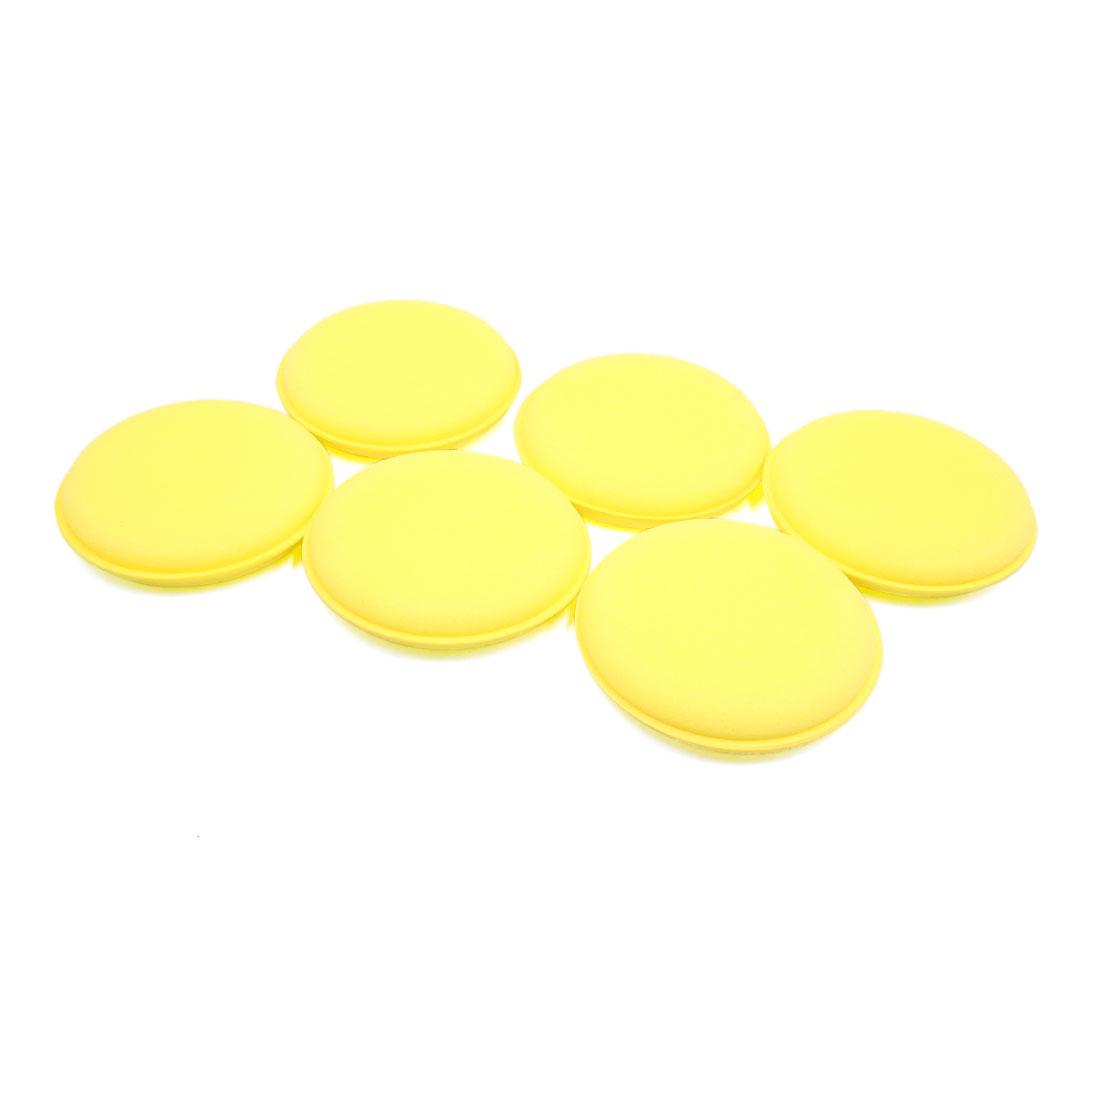 6pcs Yellow Car Vehicle Auto Waxing Polish Foam Sponge Cleaning Applicator Pads